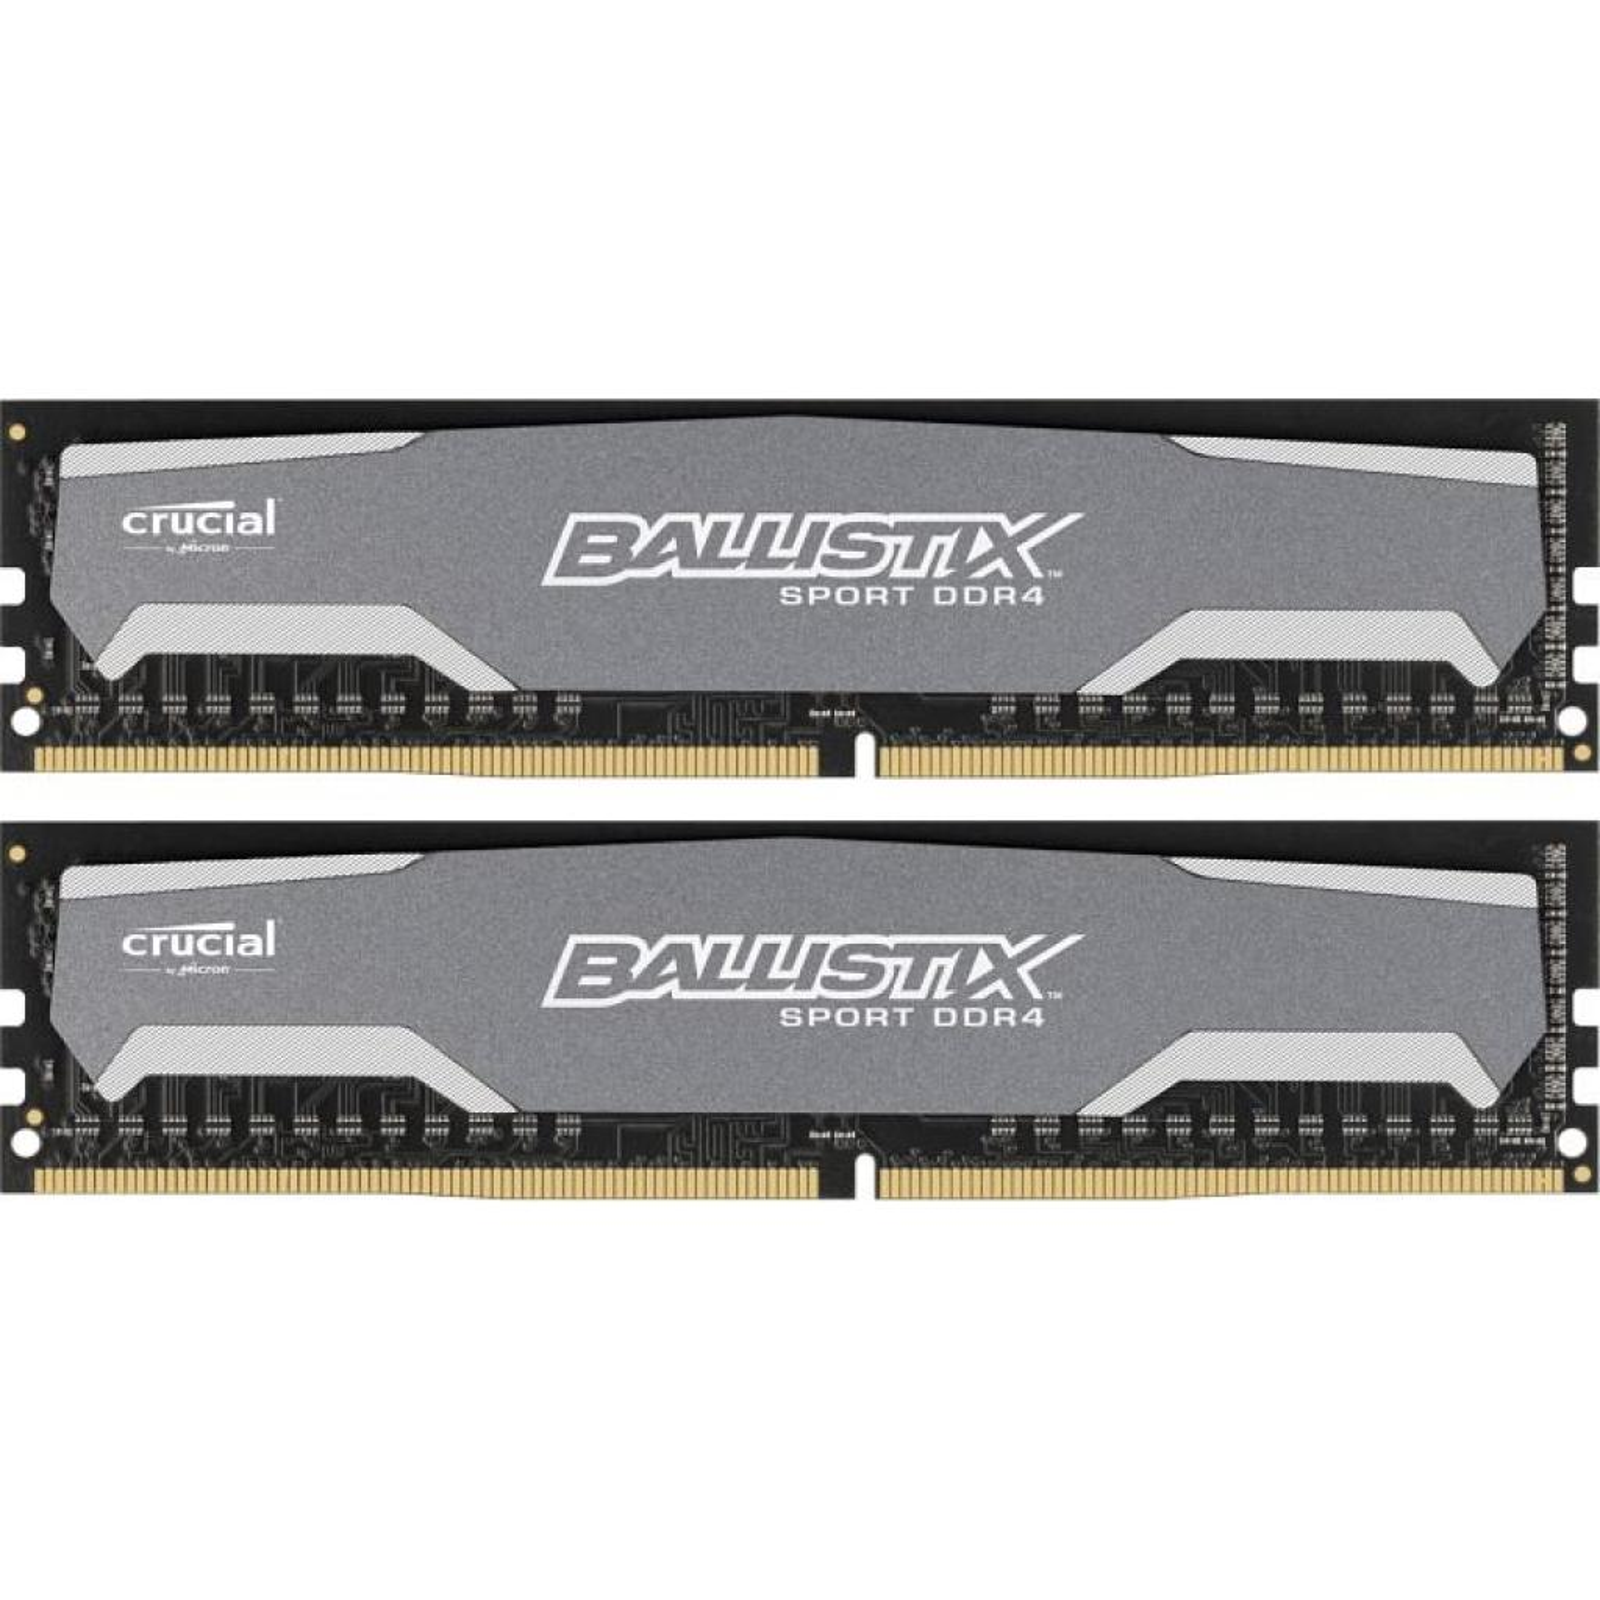 Модуль памяти для компьютера DDR4 8GB (2x4GB) 2400 MHz Ballistix Sport MICRON (BLS2C4G4D240FSA)